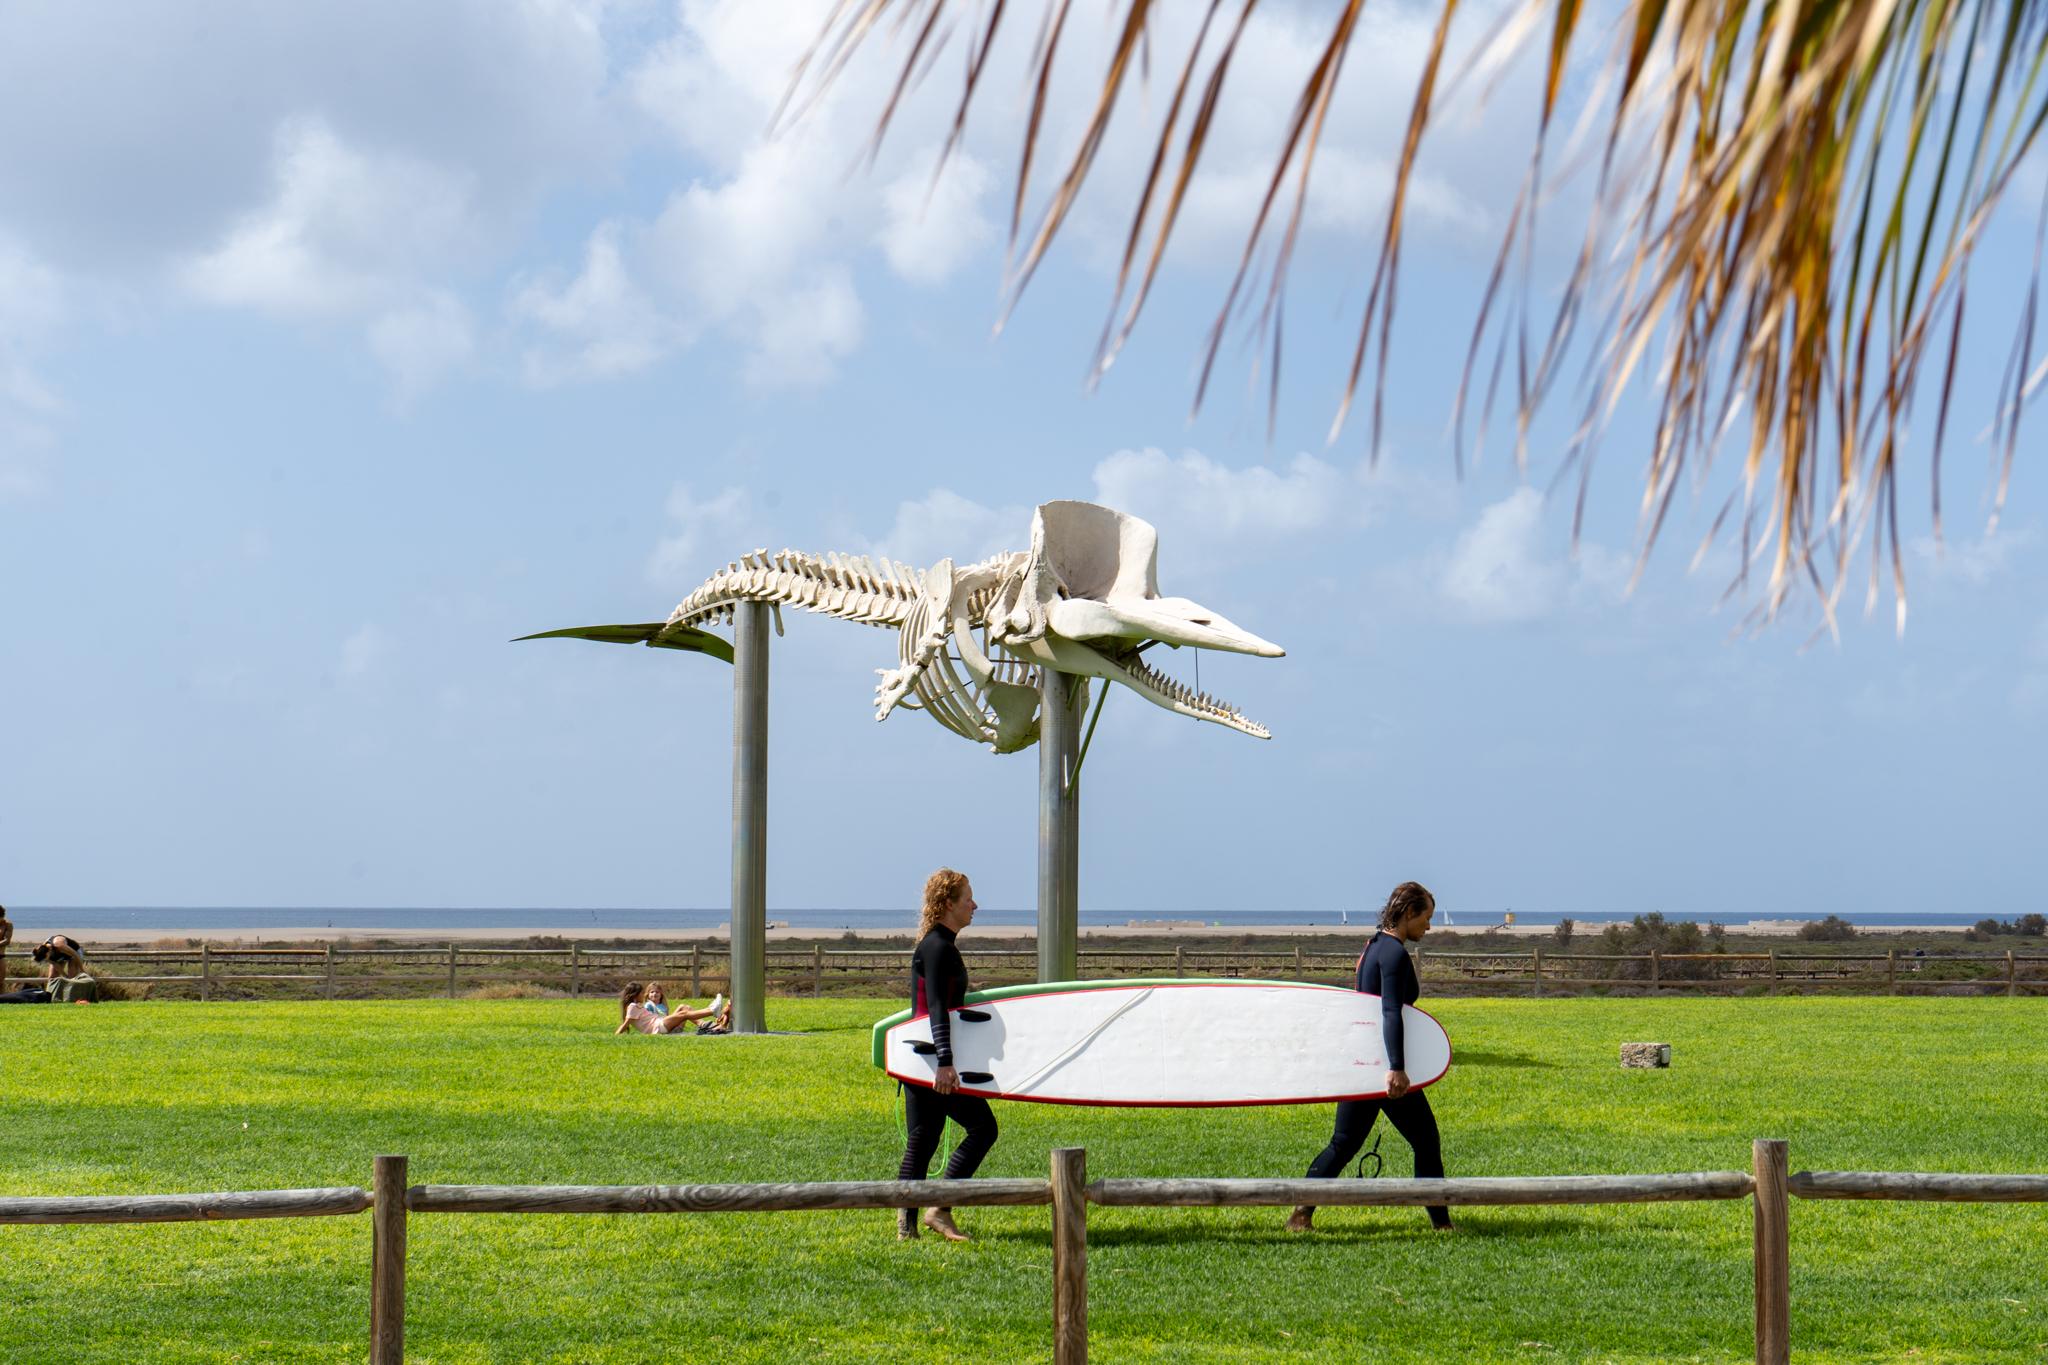 Das berühmte Walskelett am Playa de Jandia